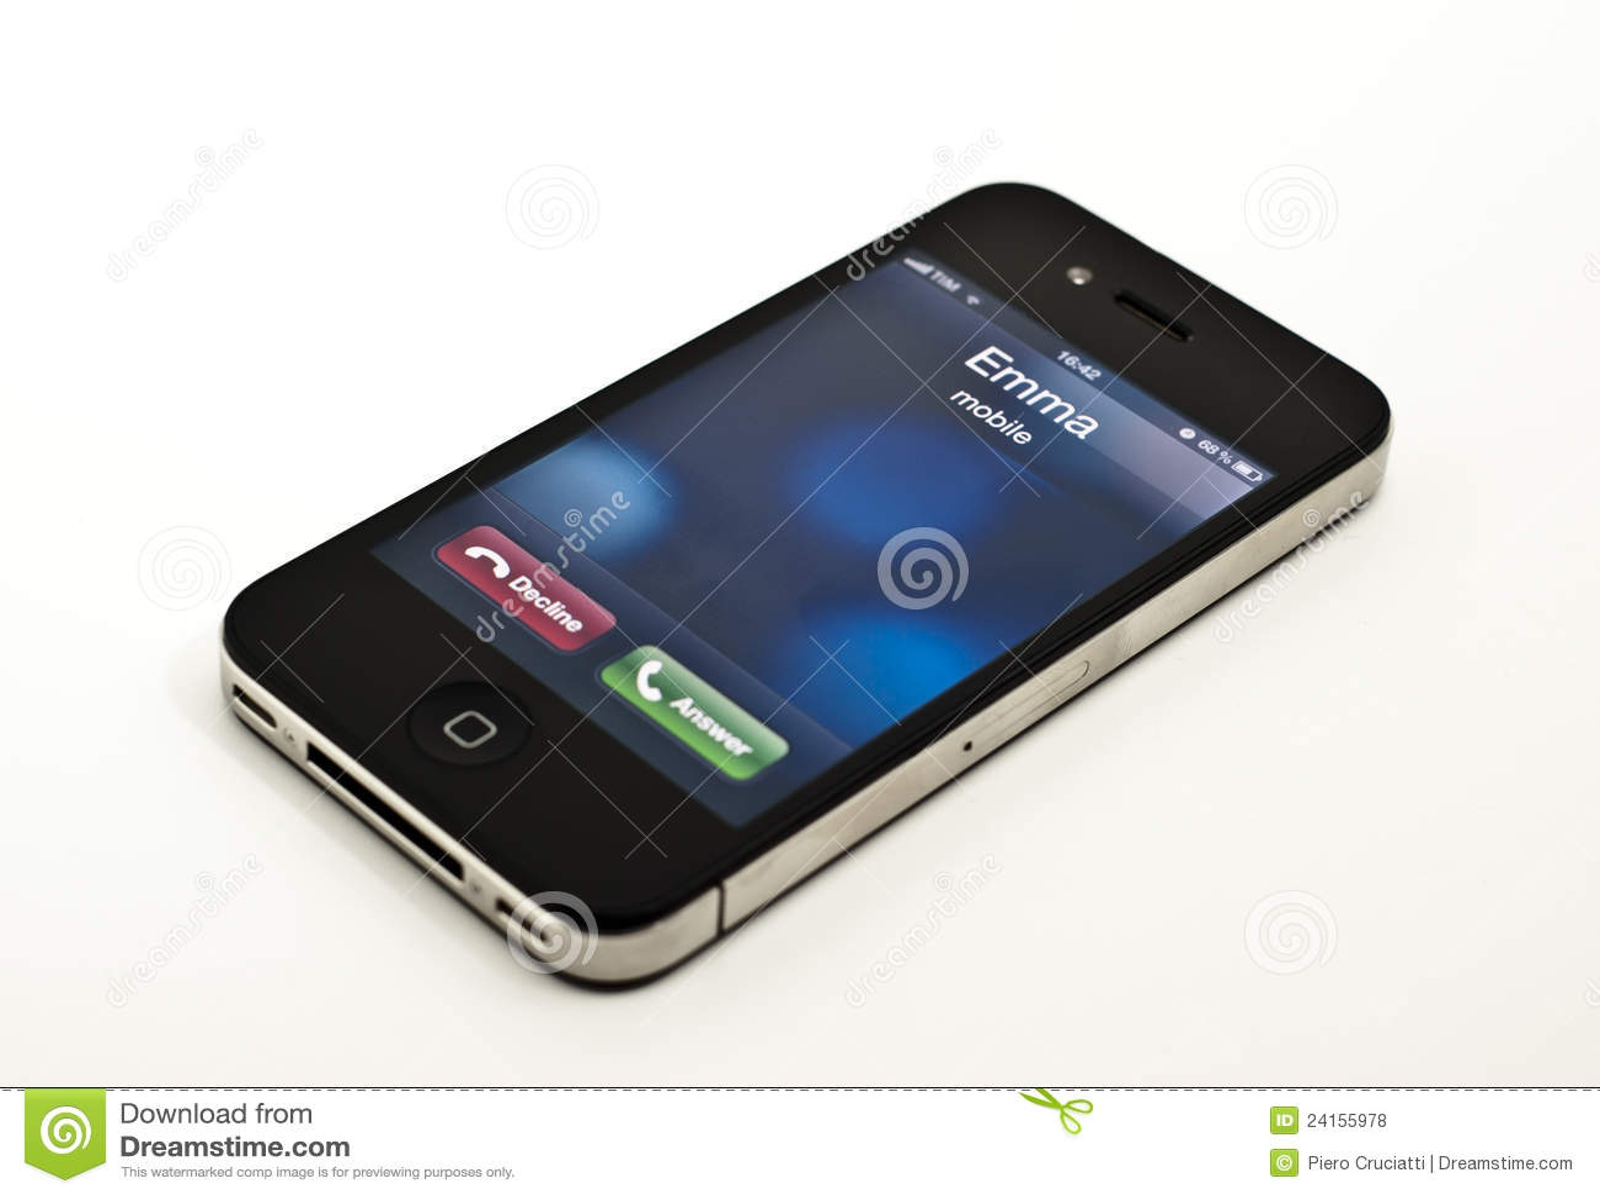 Phone Ringing In Car